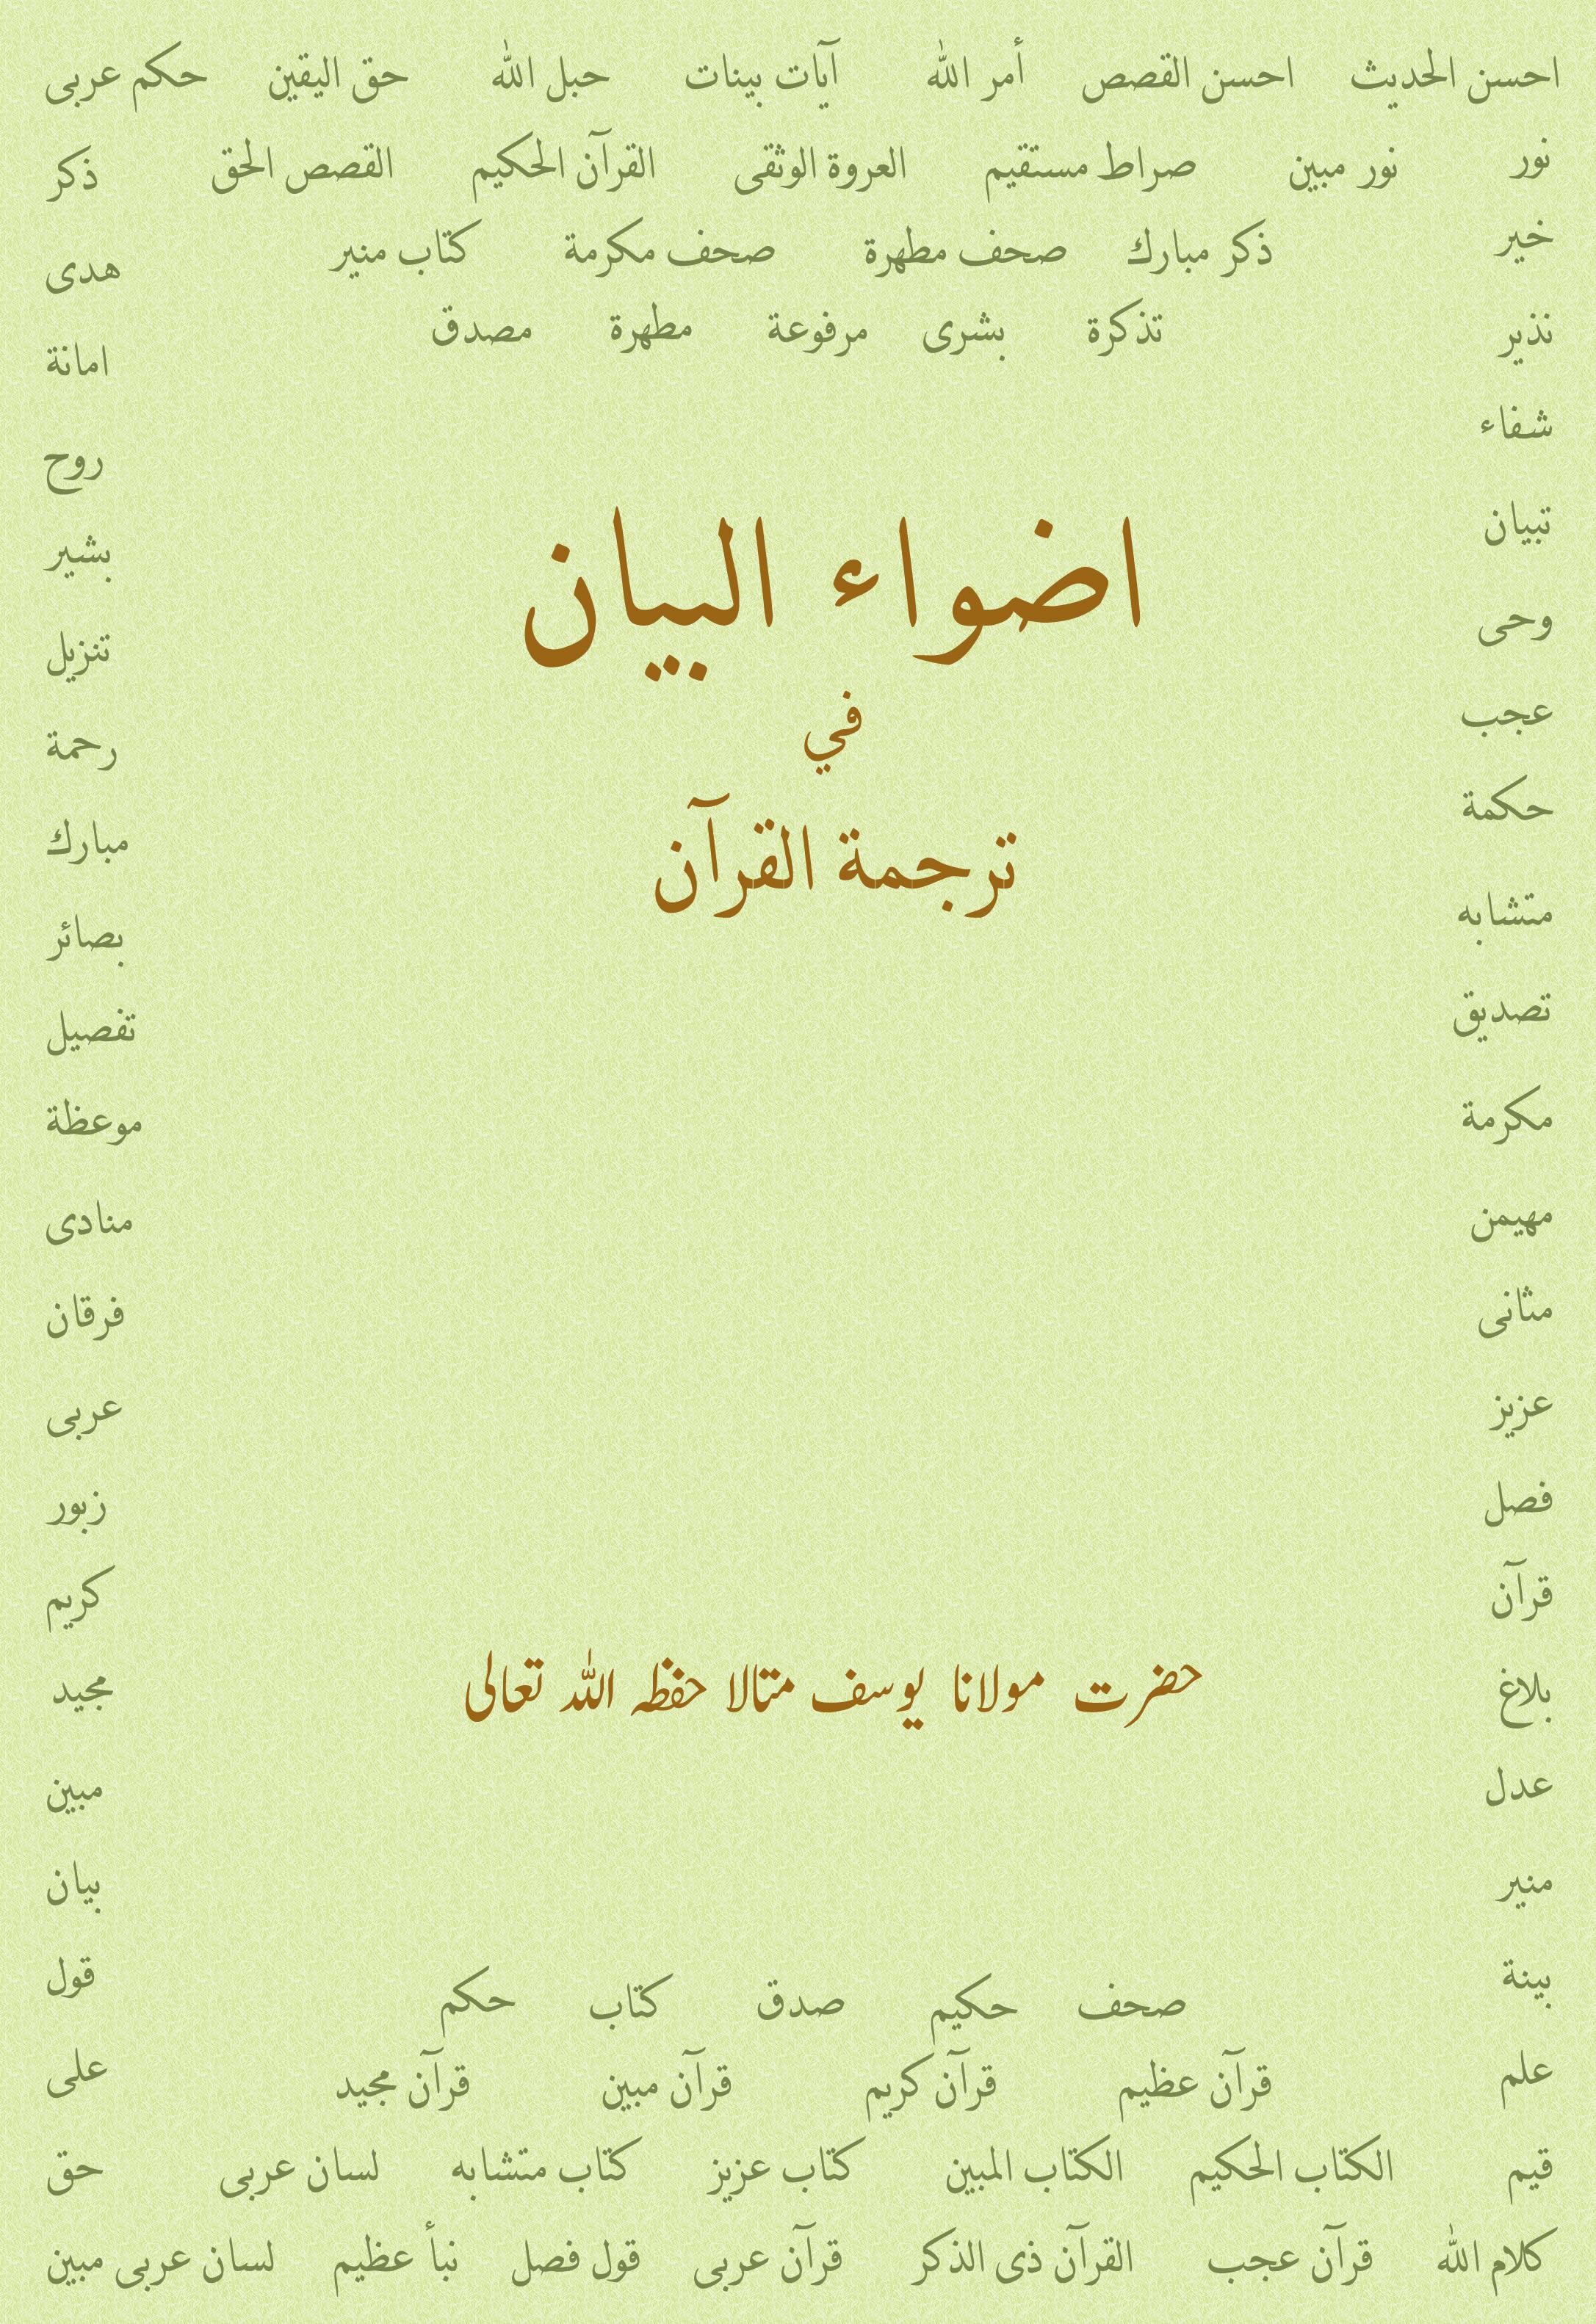 The holy al quran in bangla translation